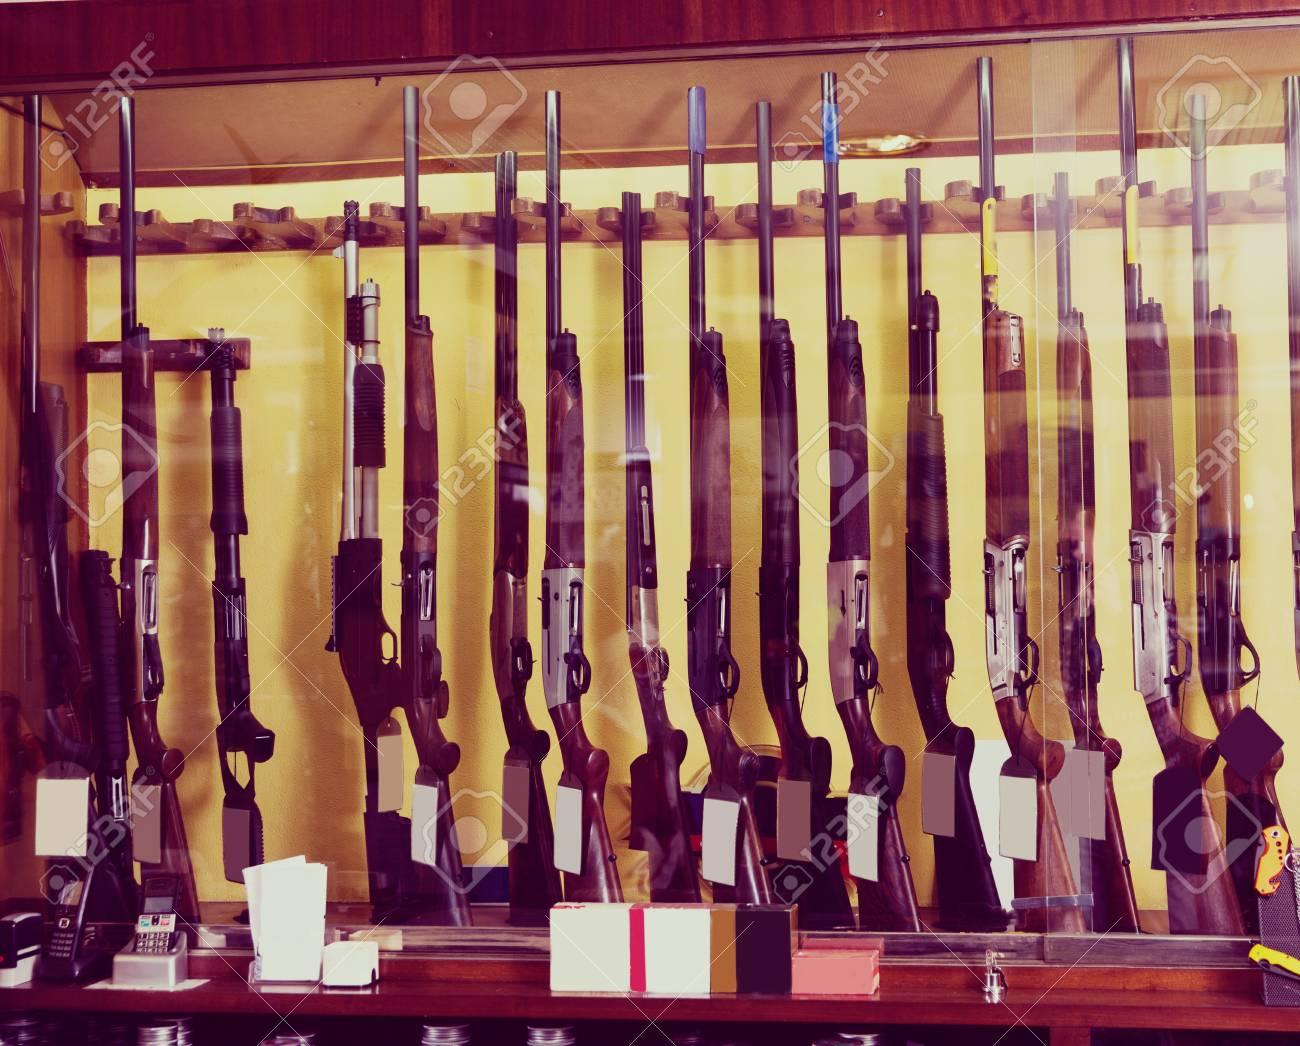 Gun Store Interior With Different Rifles On Showcase Stock Photo